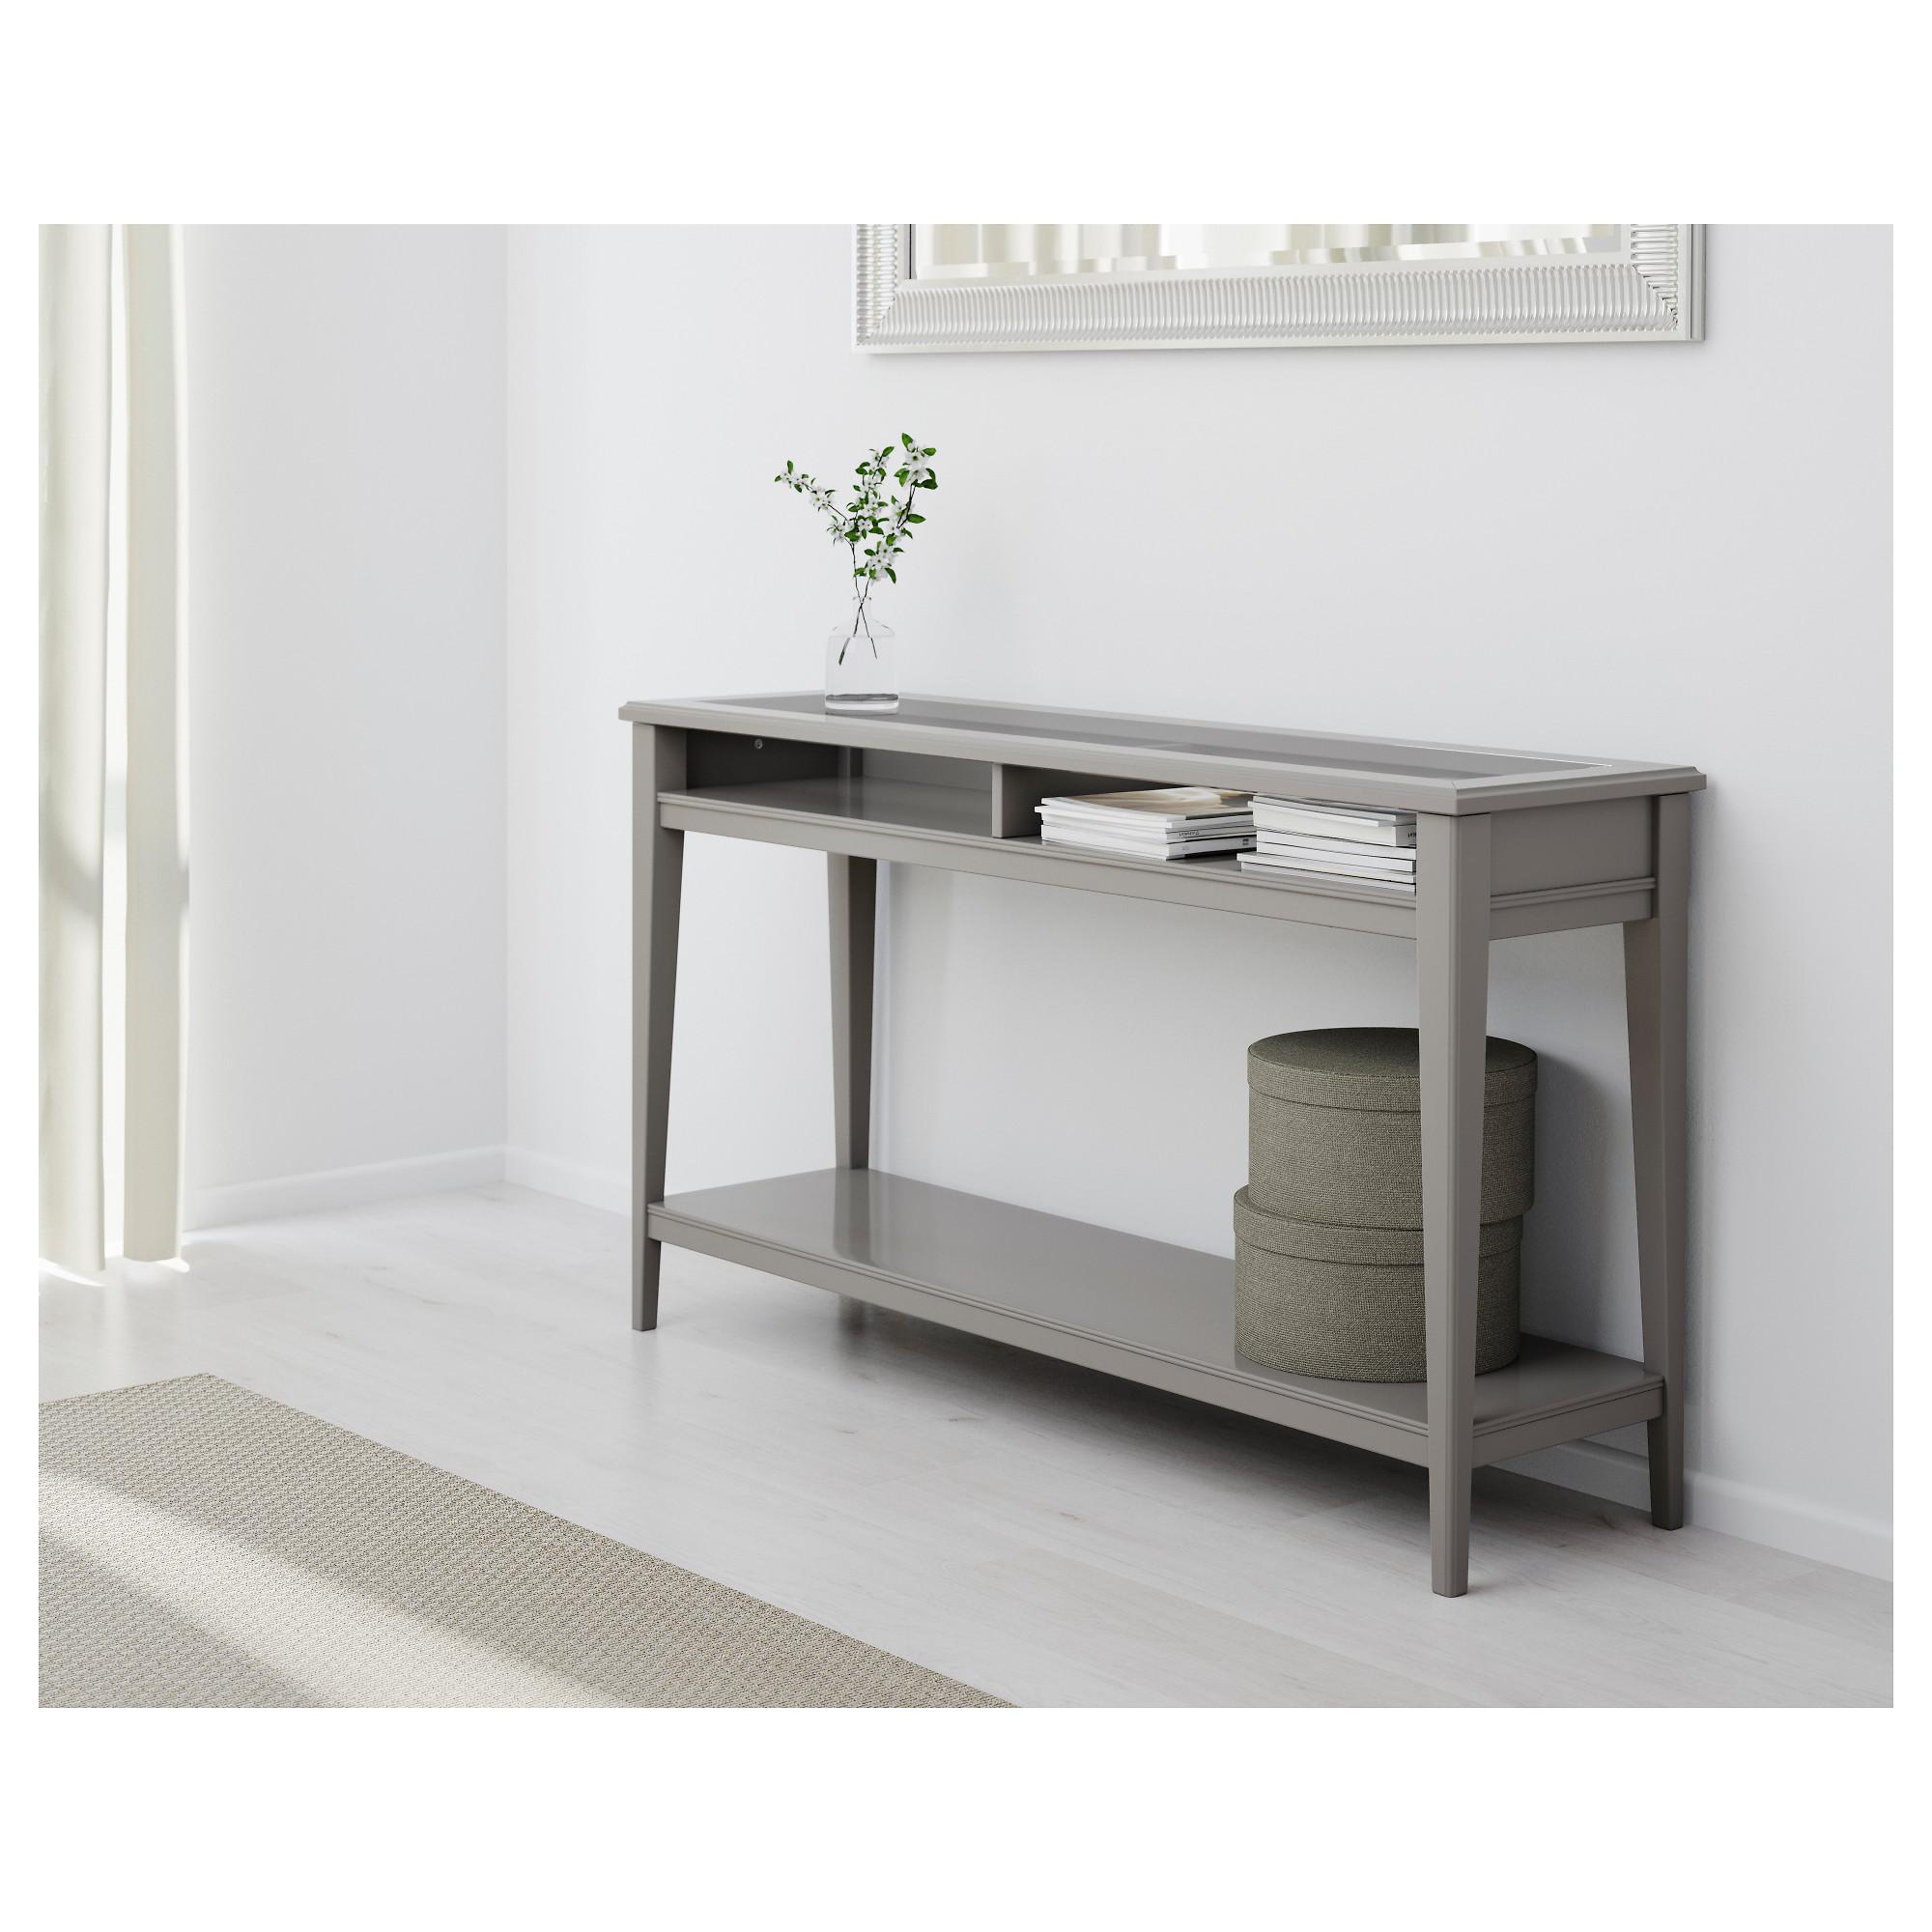 sofa table liatorp console table - white/glass - ikea FYBFBOO